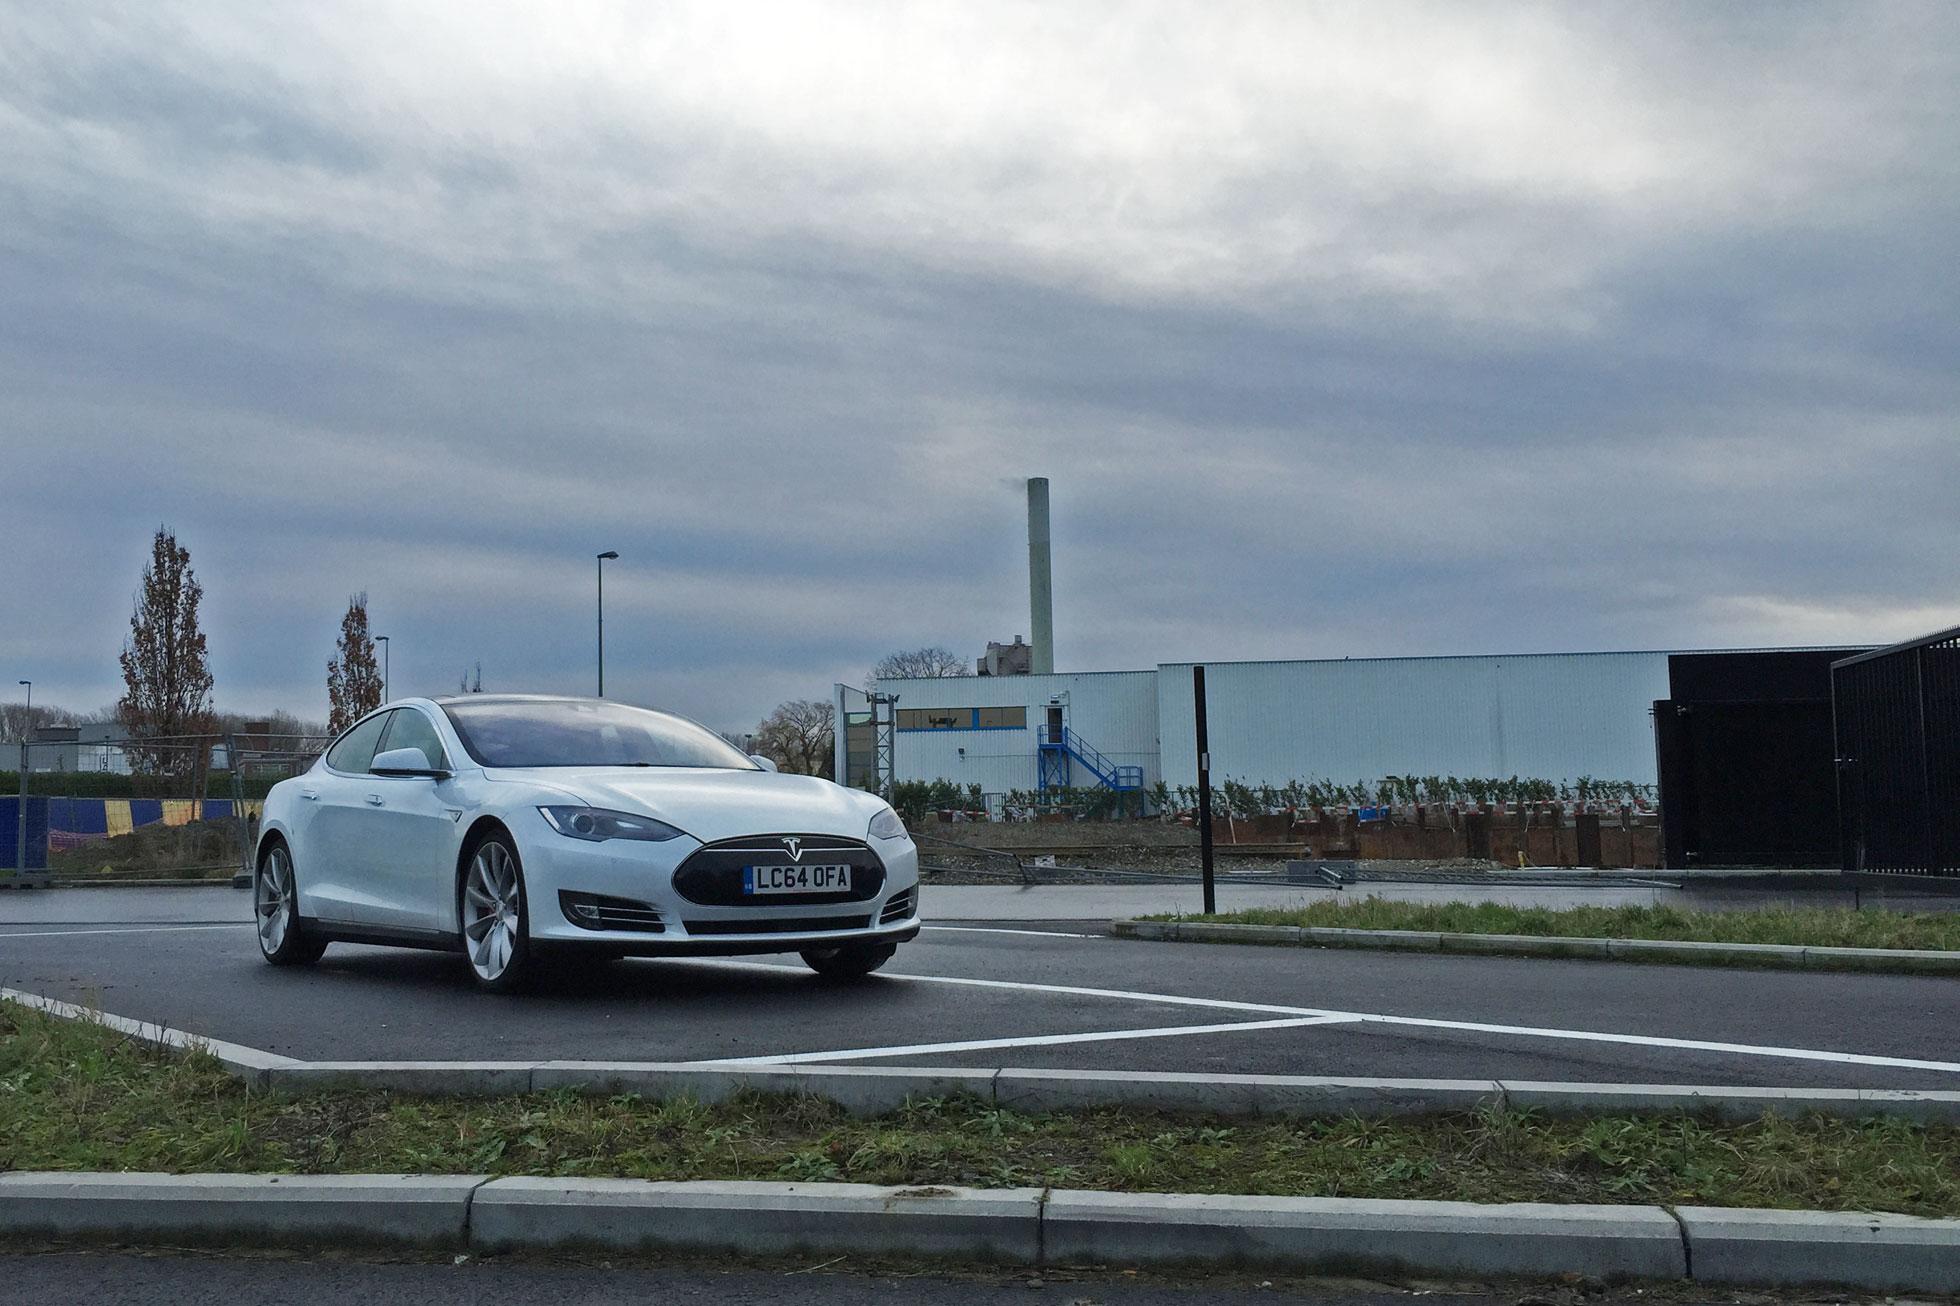 54_Tesla_Model_S_Motoring Research